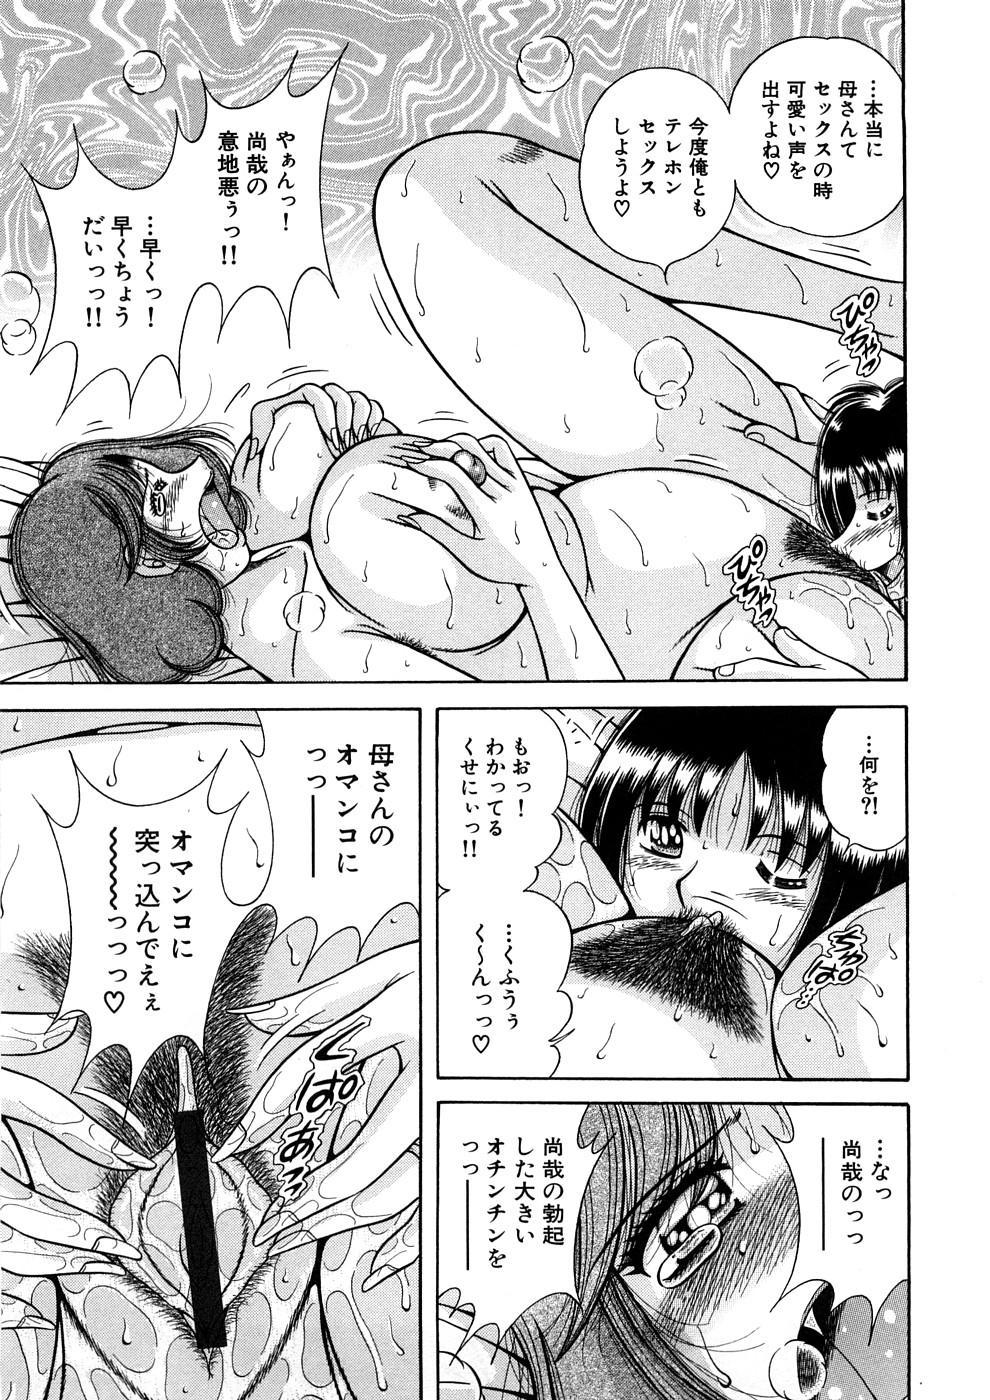 Geki Yaba Anthology Vol. 1 - Naka ni Dashite yo 209